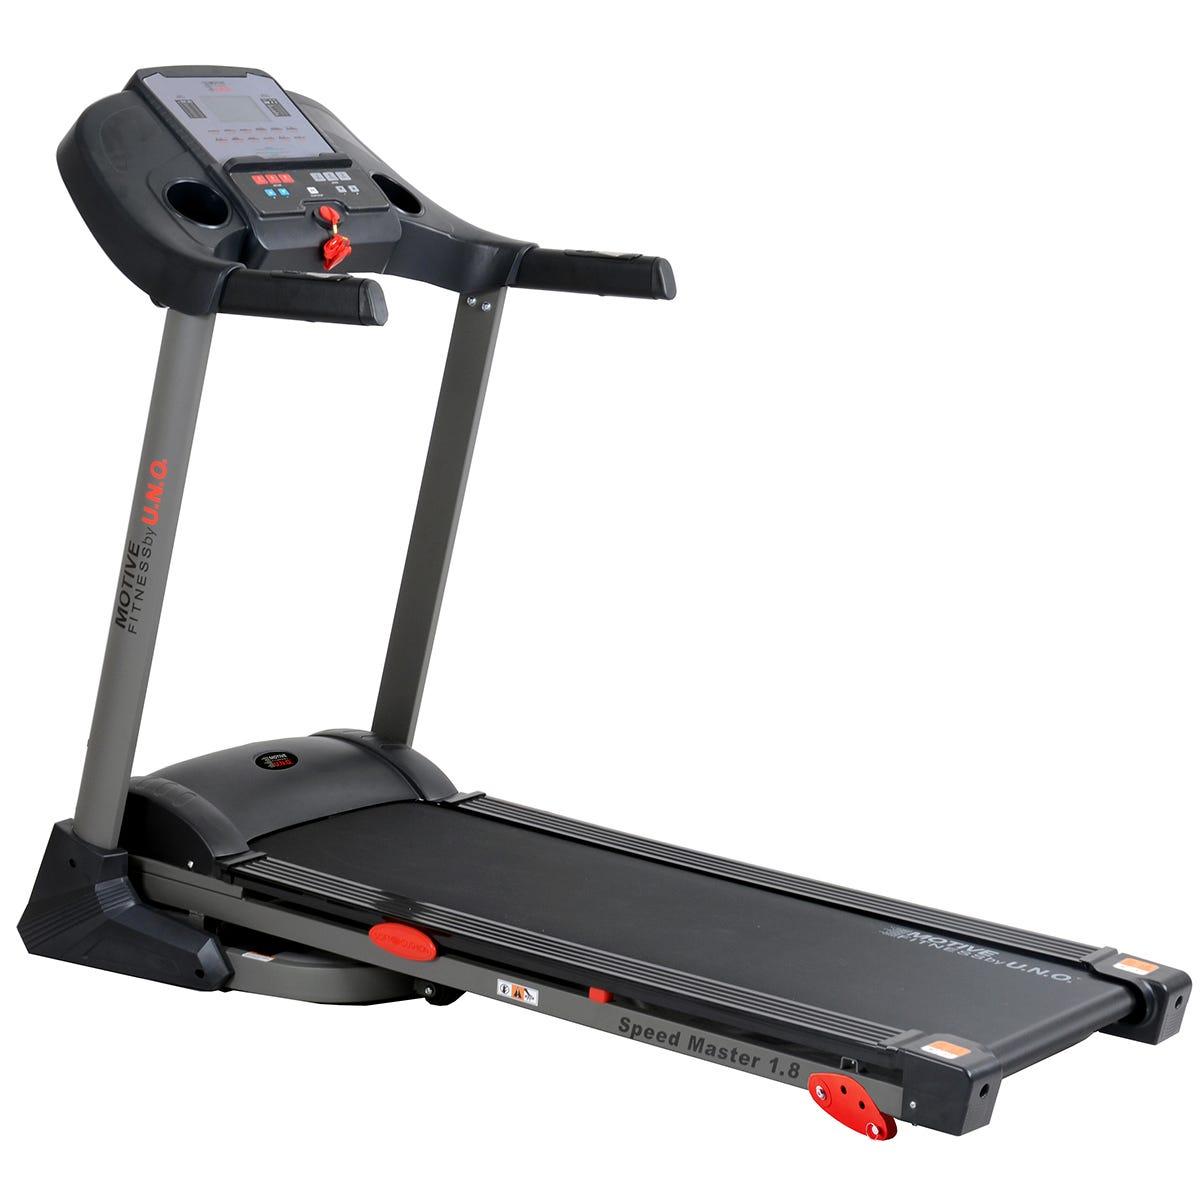 Motive Fitness MOTIVEfitness by UNO Speedmaster 1.8M Manual Incline Treadmill - Black